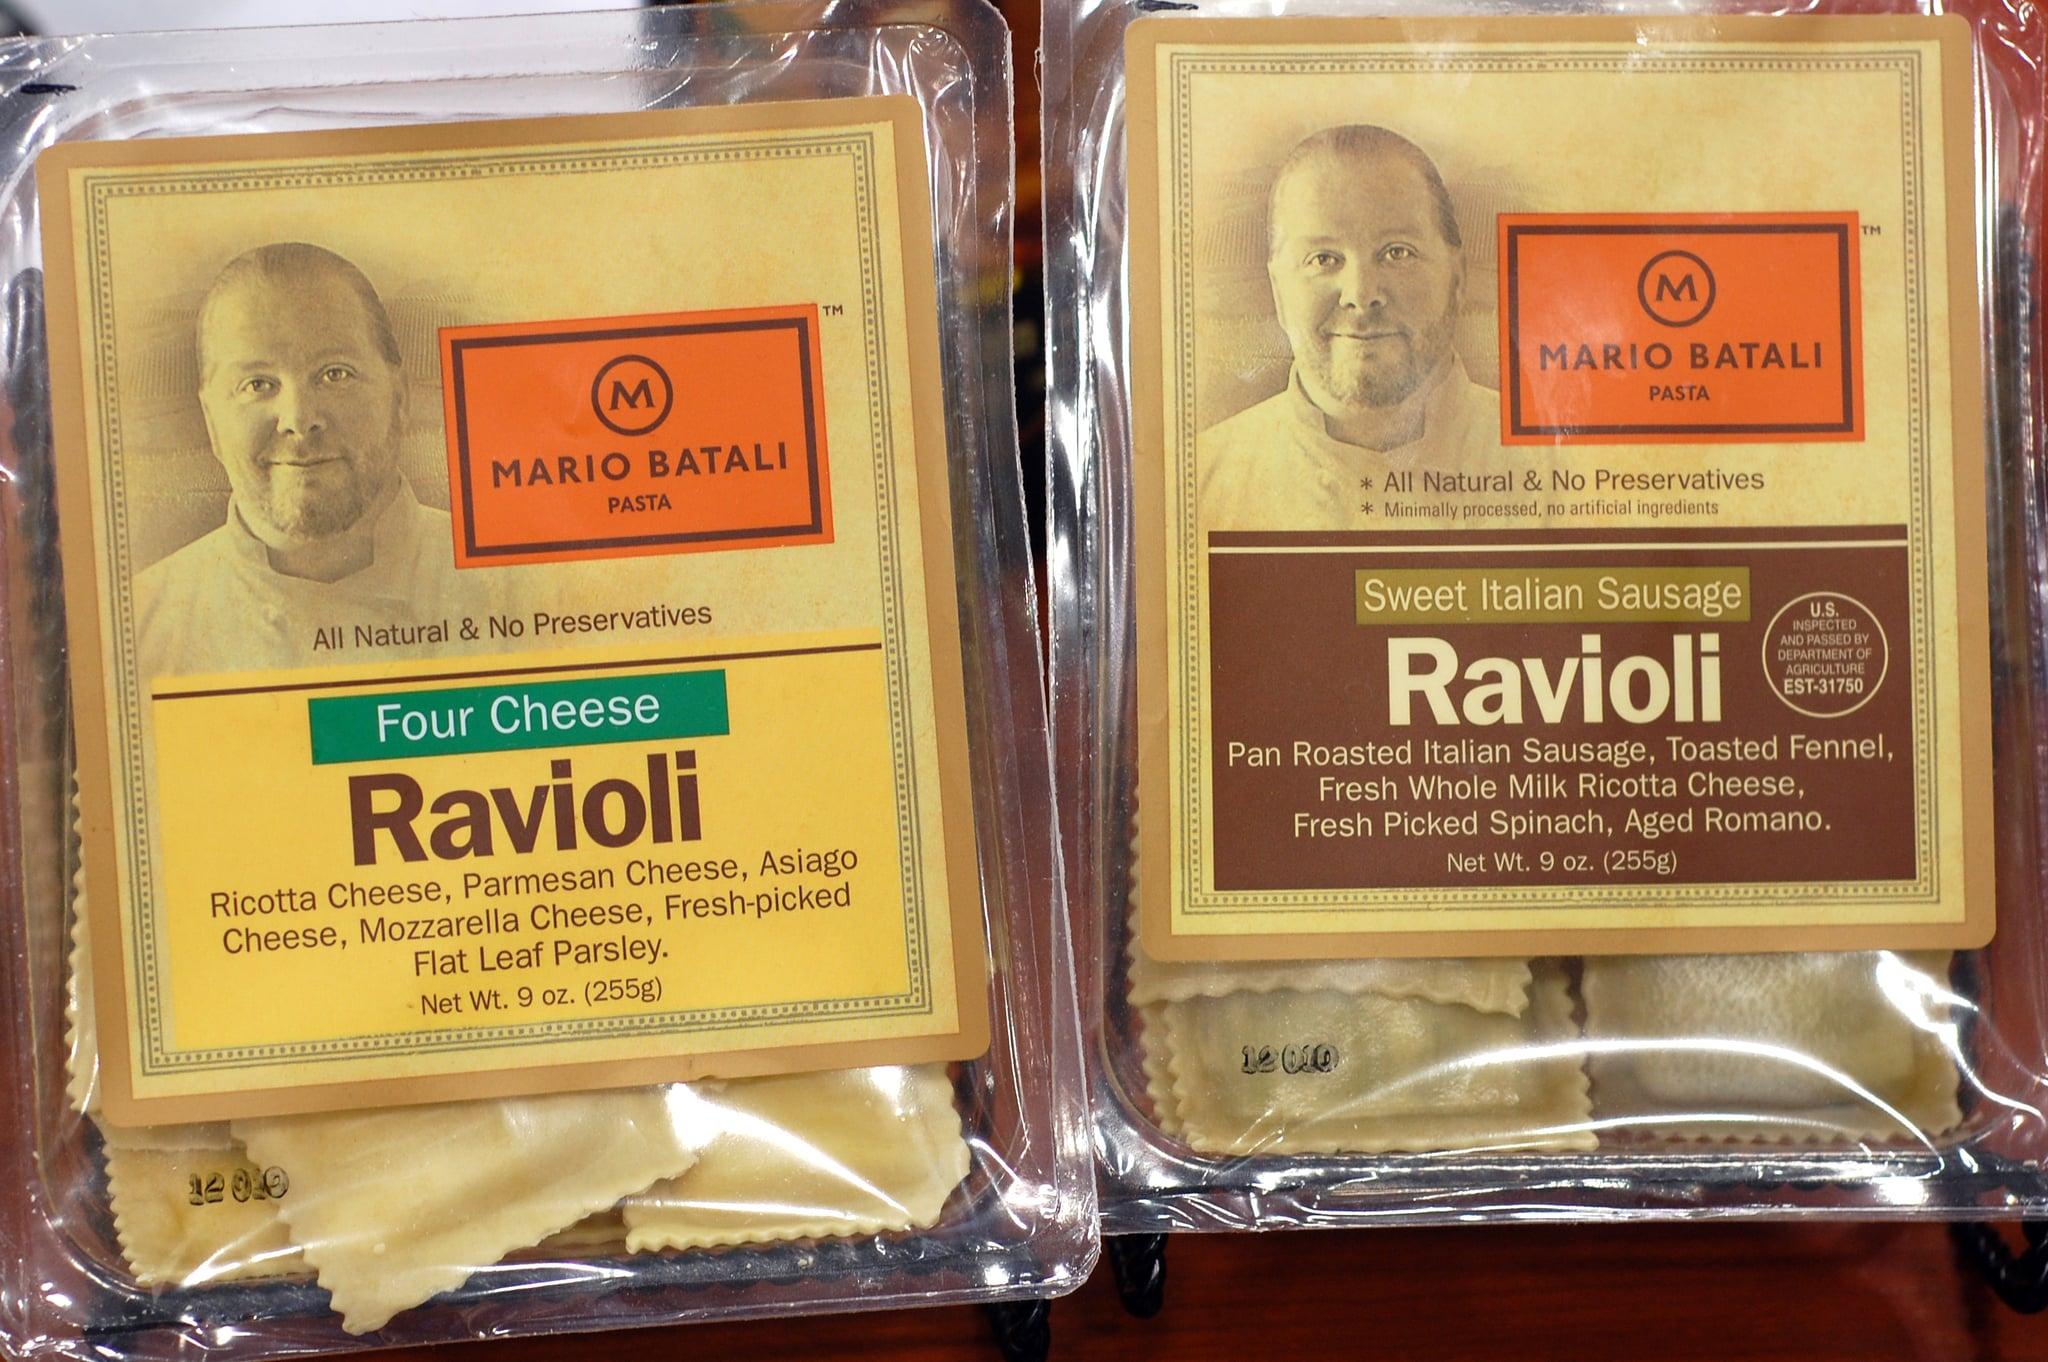 Mario Batali: Sweet Italian Sausage and Four Cheese